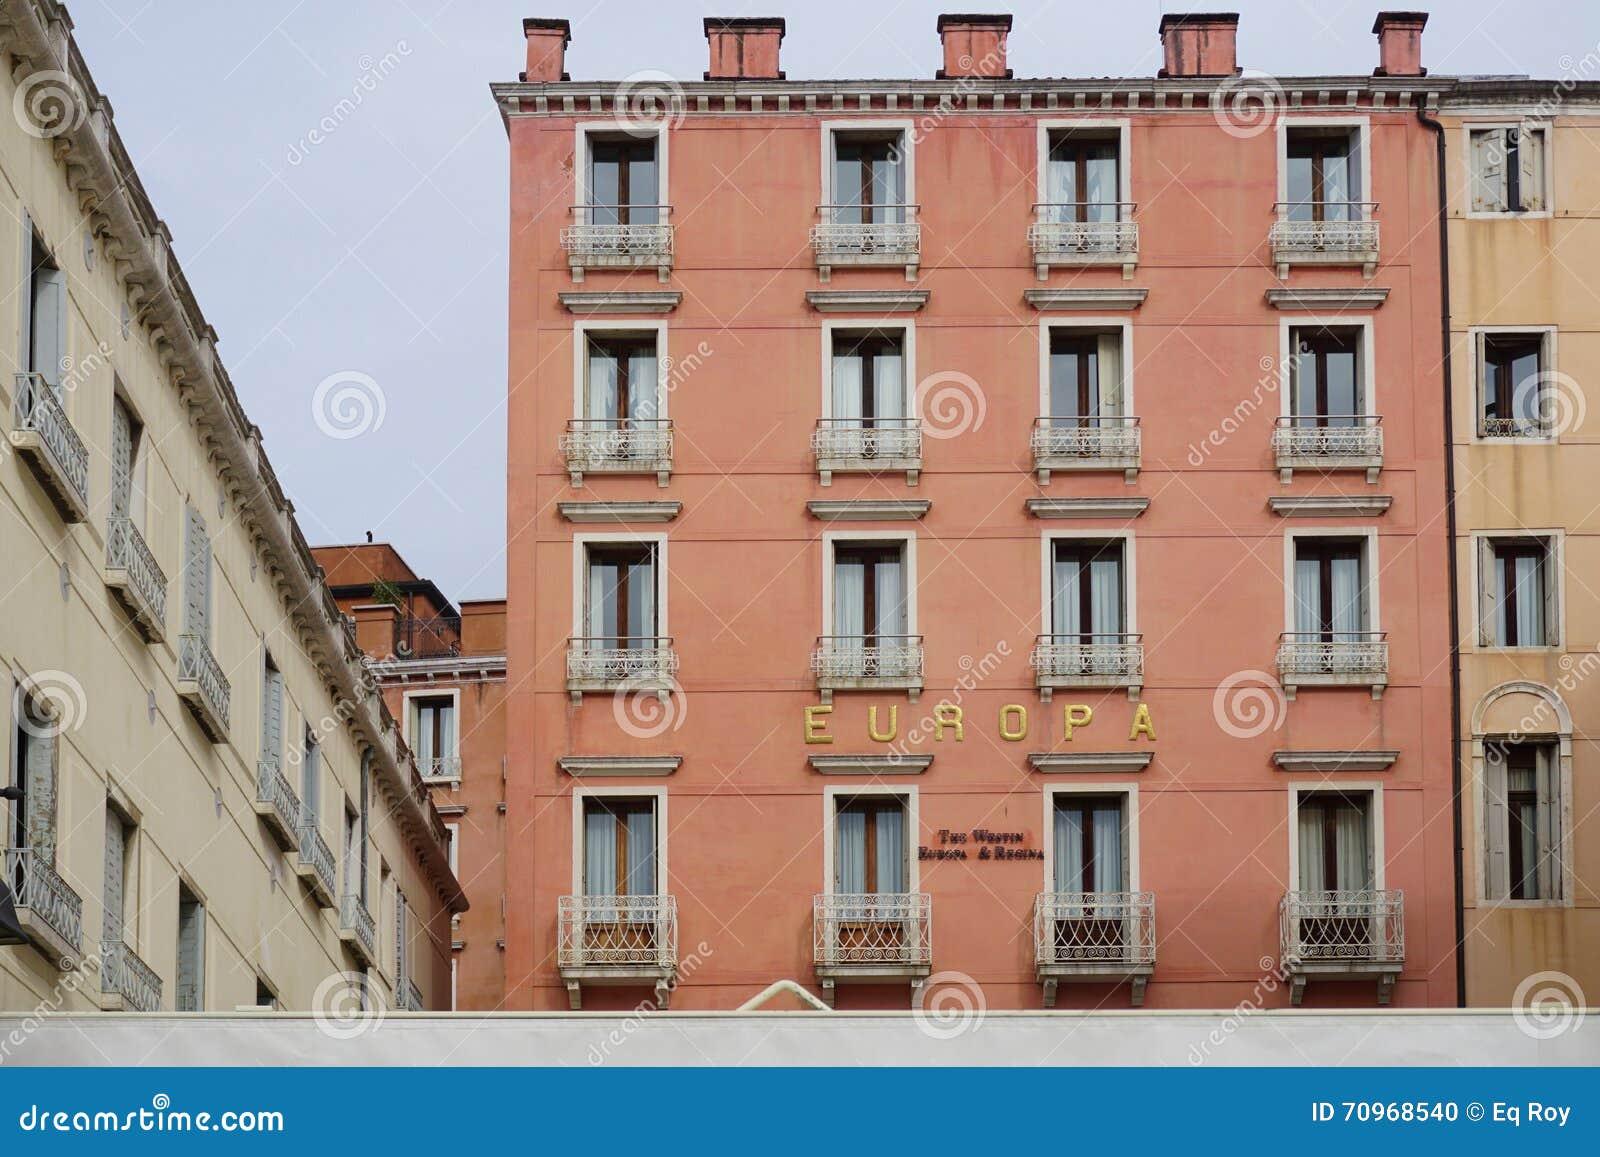 Rooms: The Westin Europa And Regina Hotel In Venice Editorial